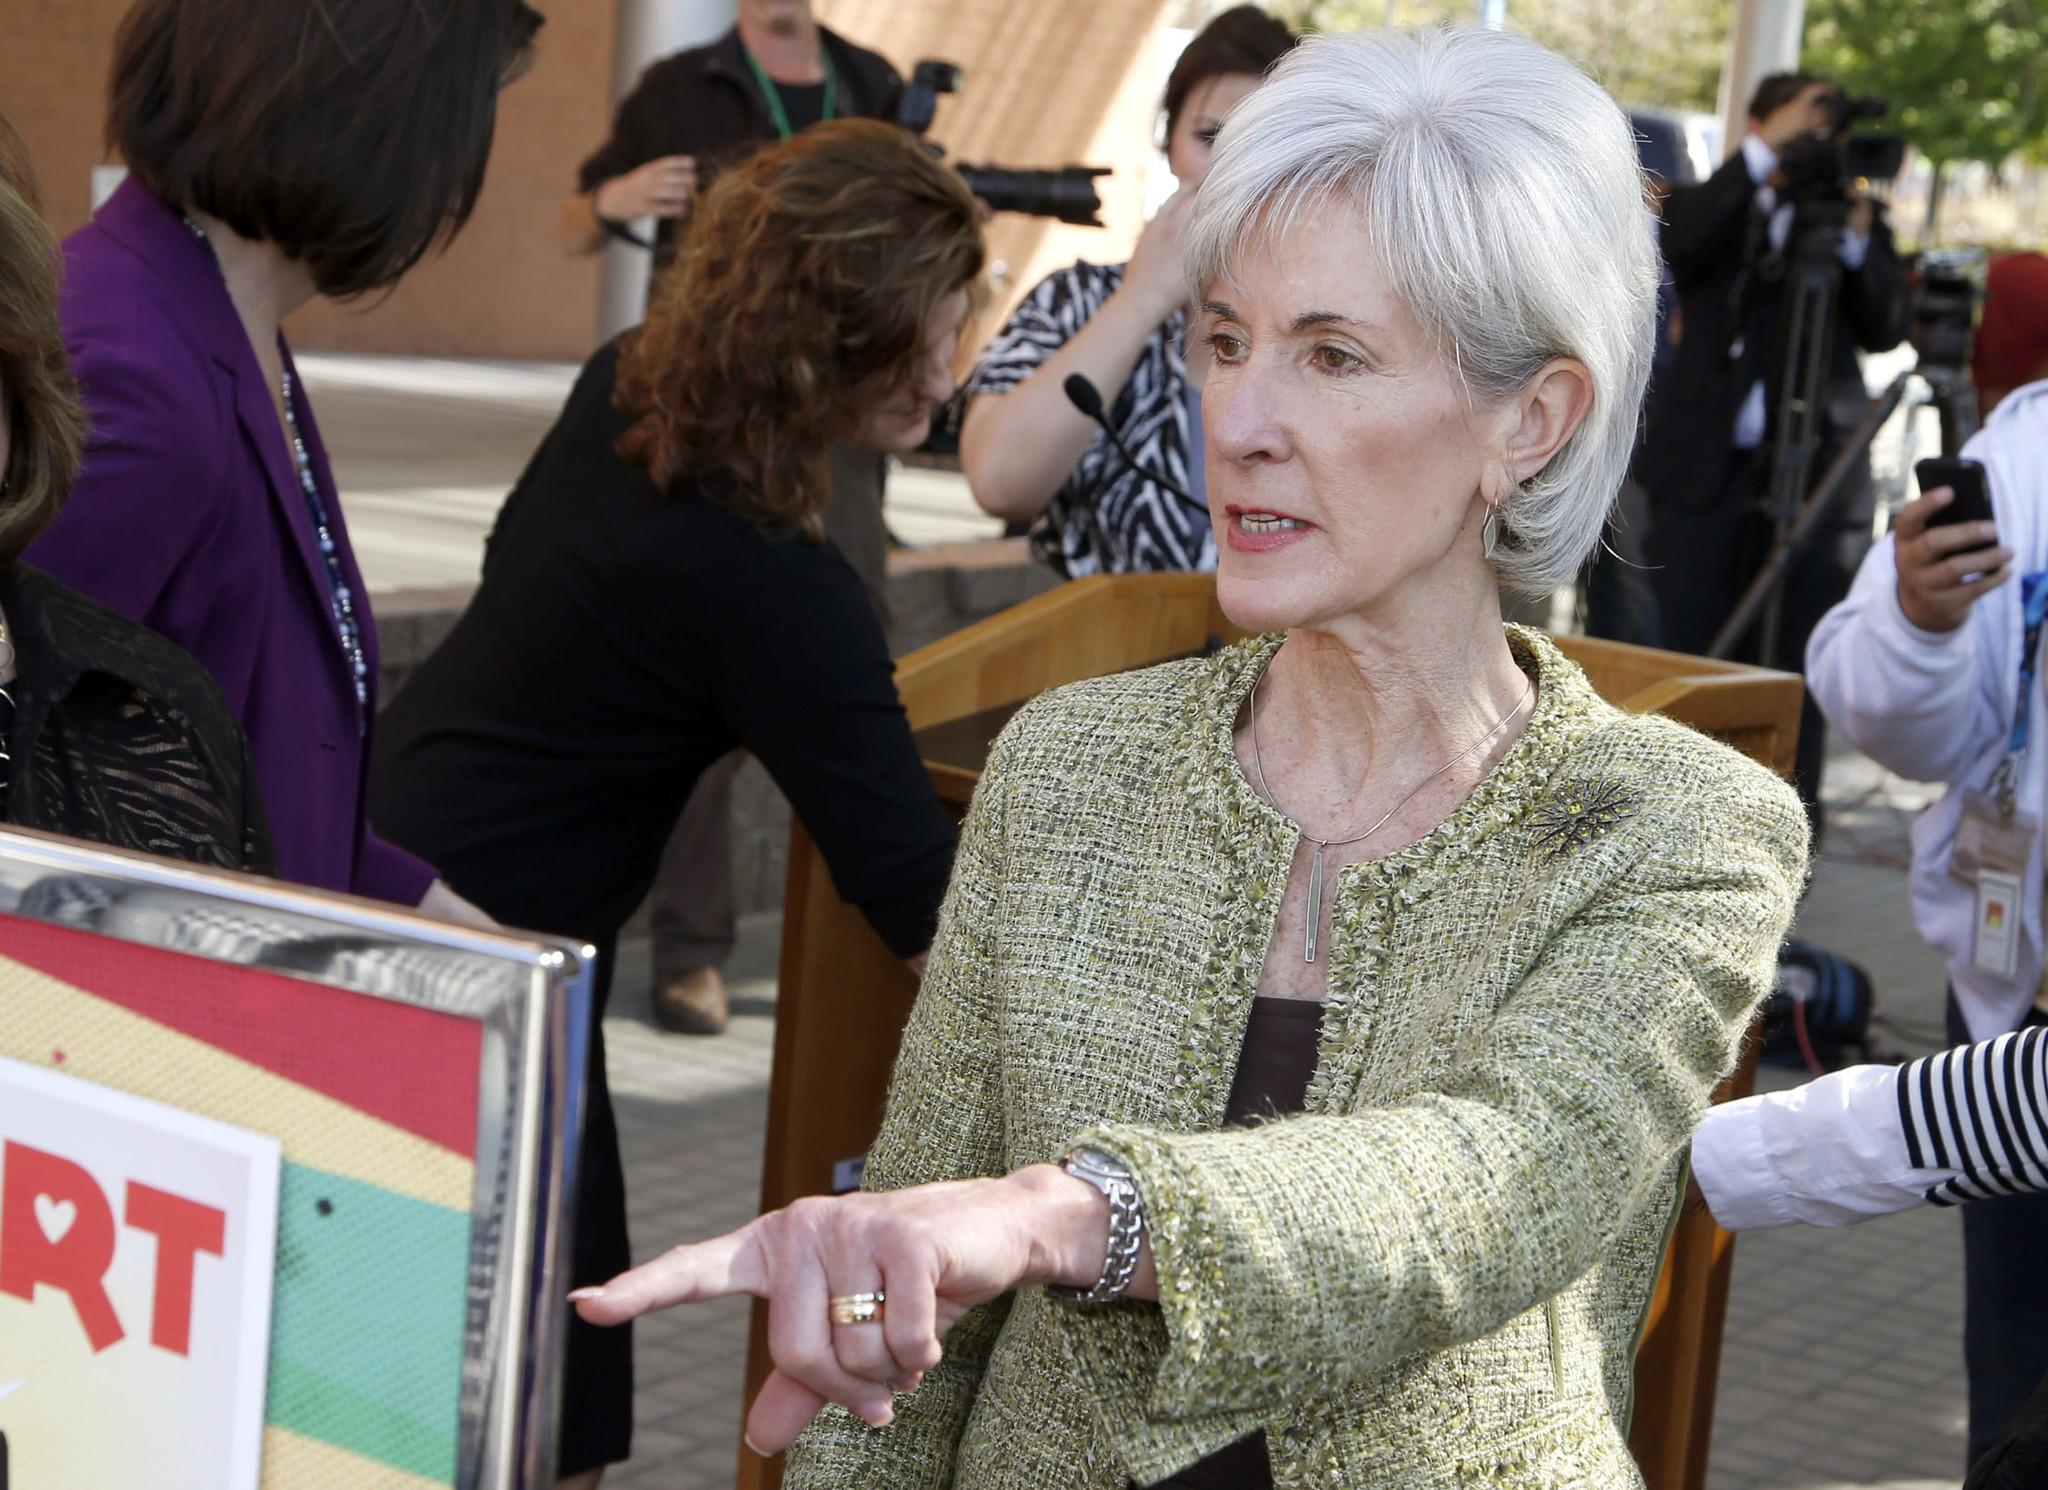 U.S. 'wasted two months' in coronavirus response: former HHS Secretary Kathleen Sebelius